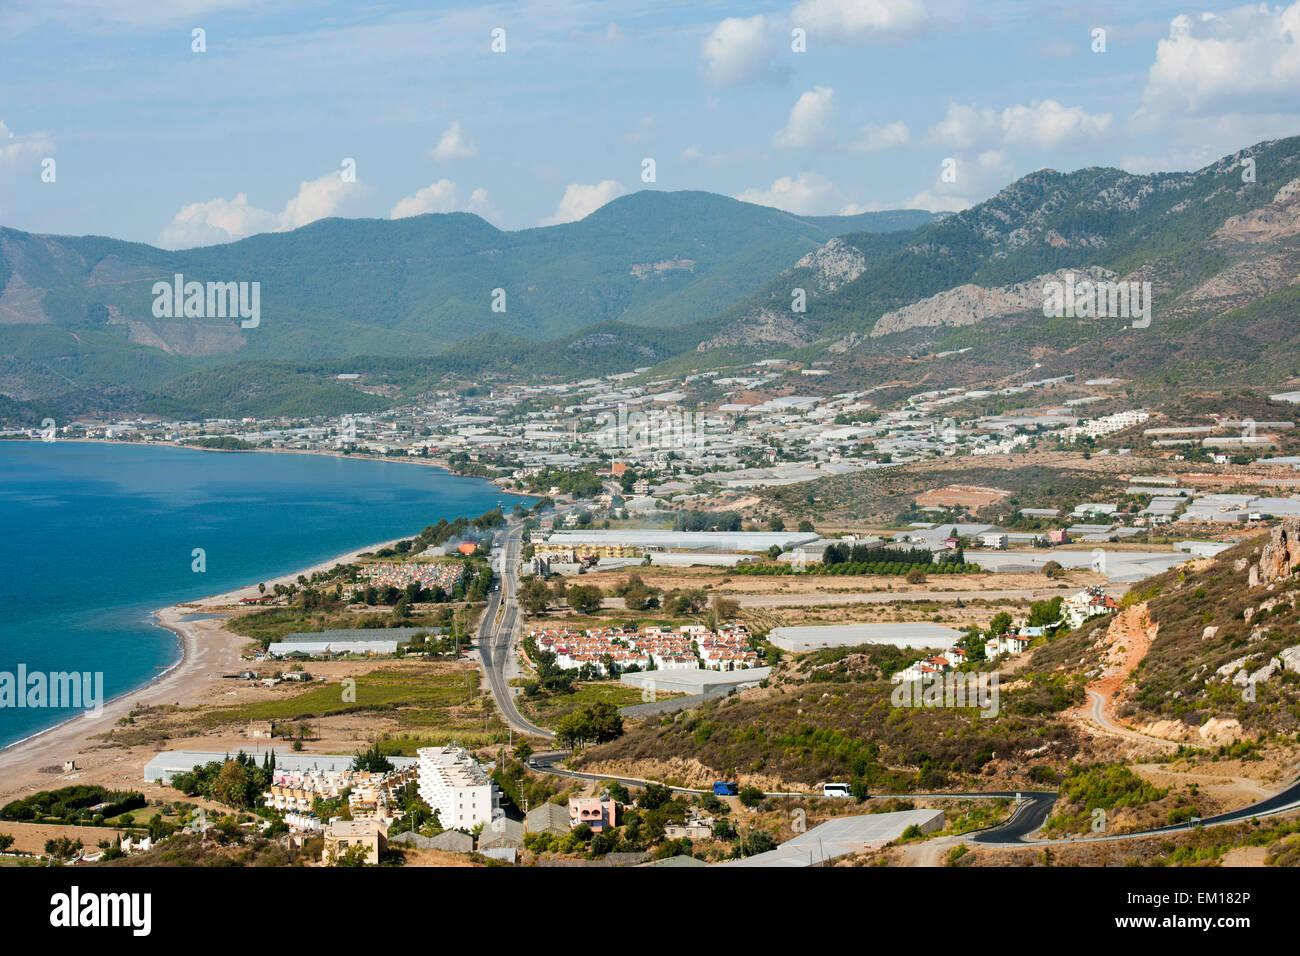 Türkei, Provinz Mersin (Icel), Bucht von Tekeli an der Küste bei Aydincik - Stock Image